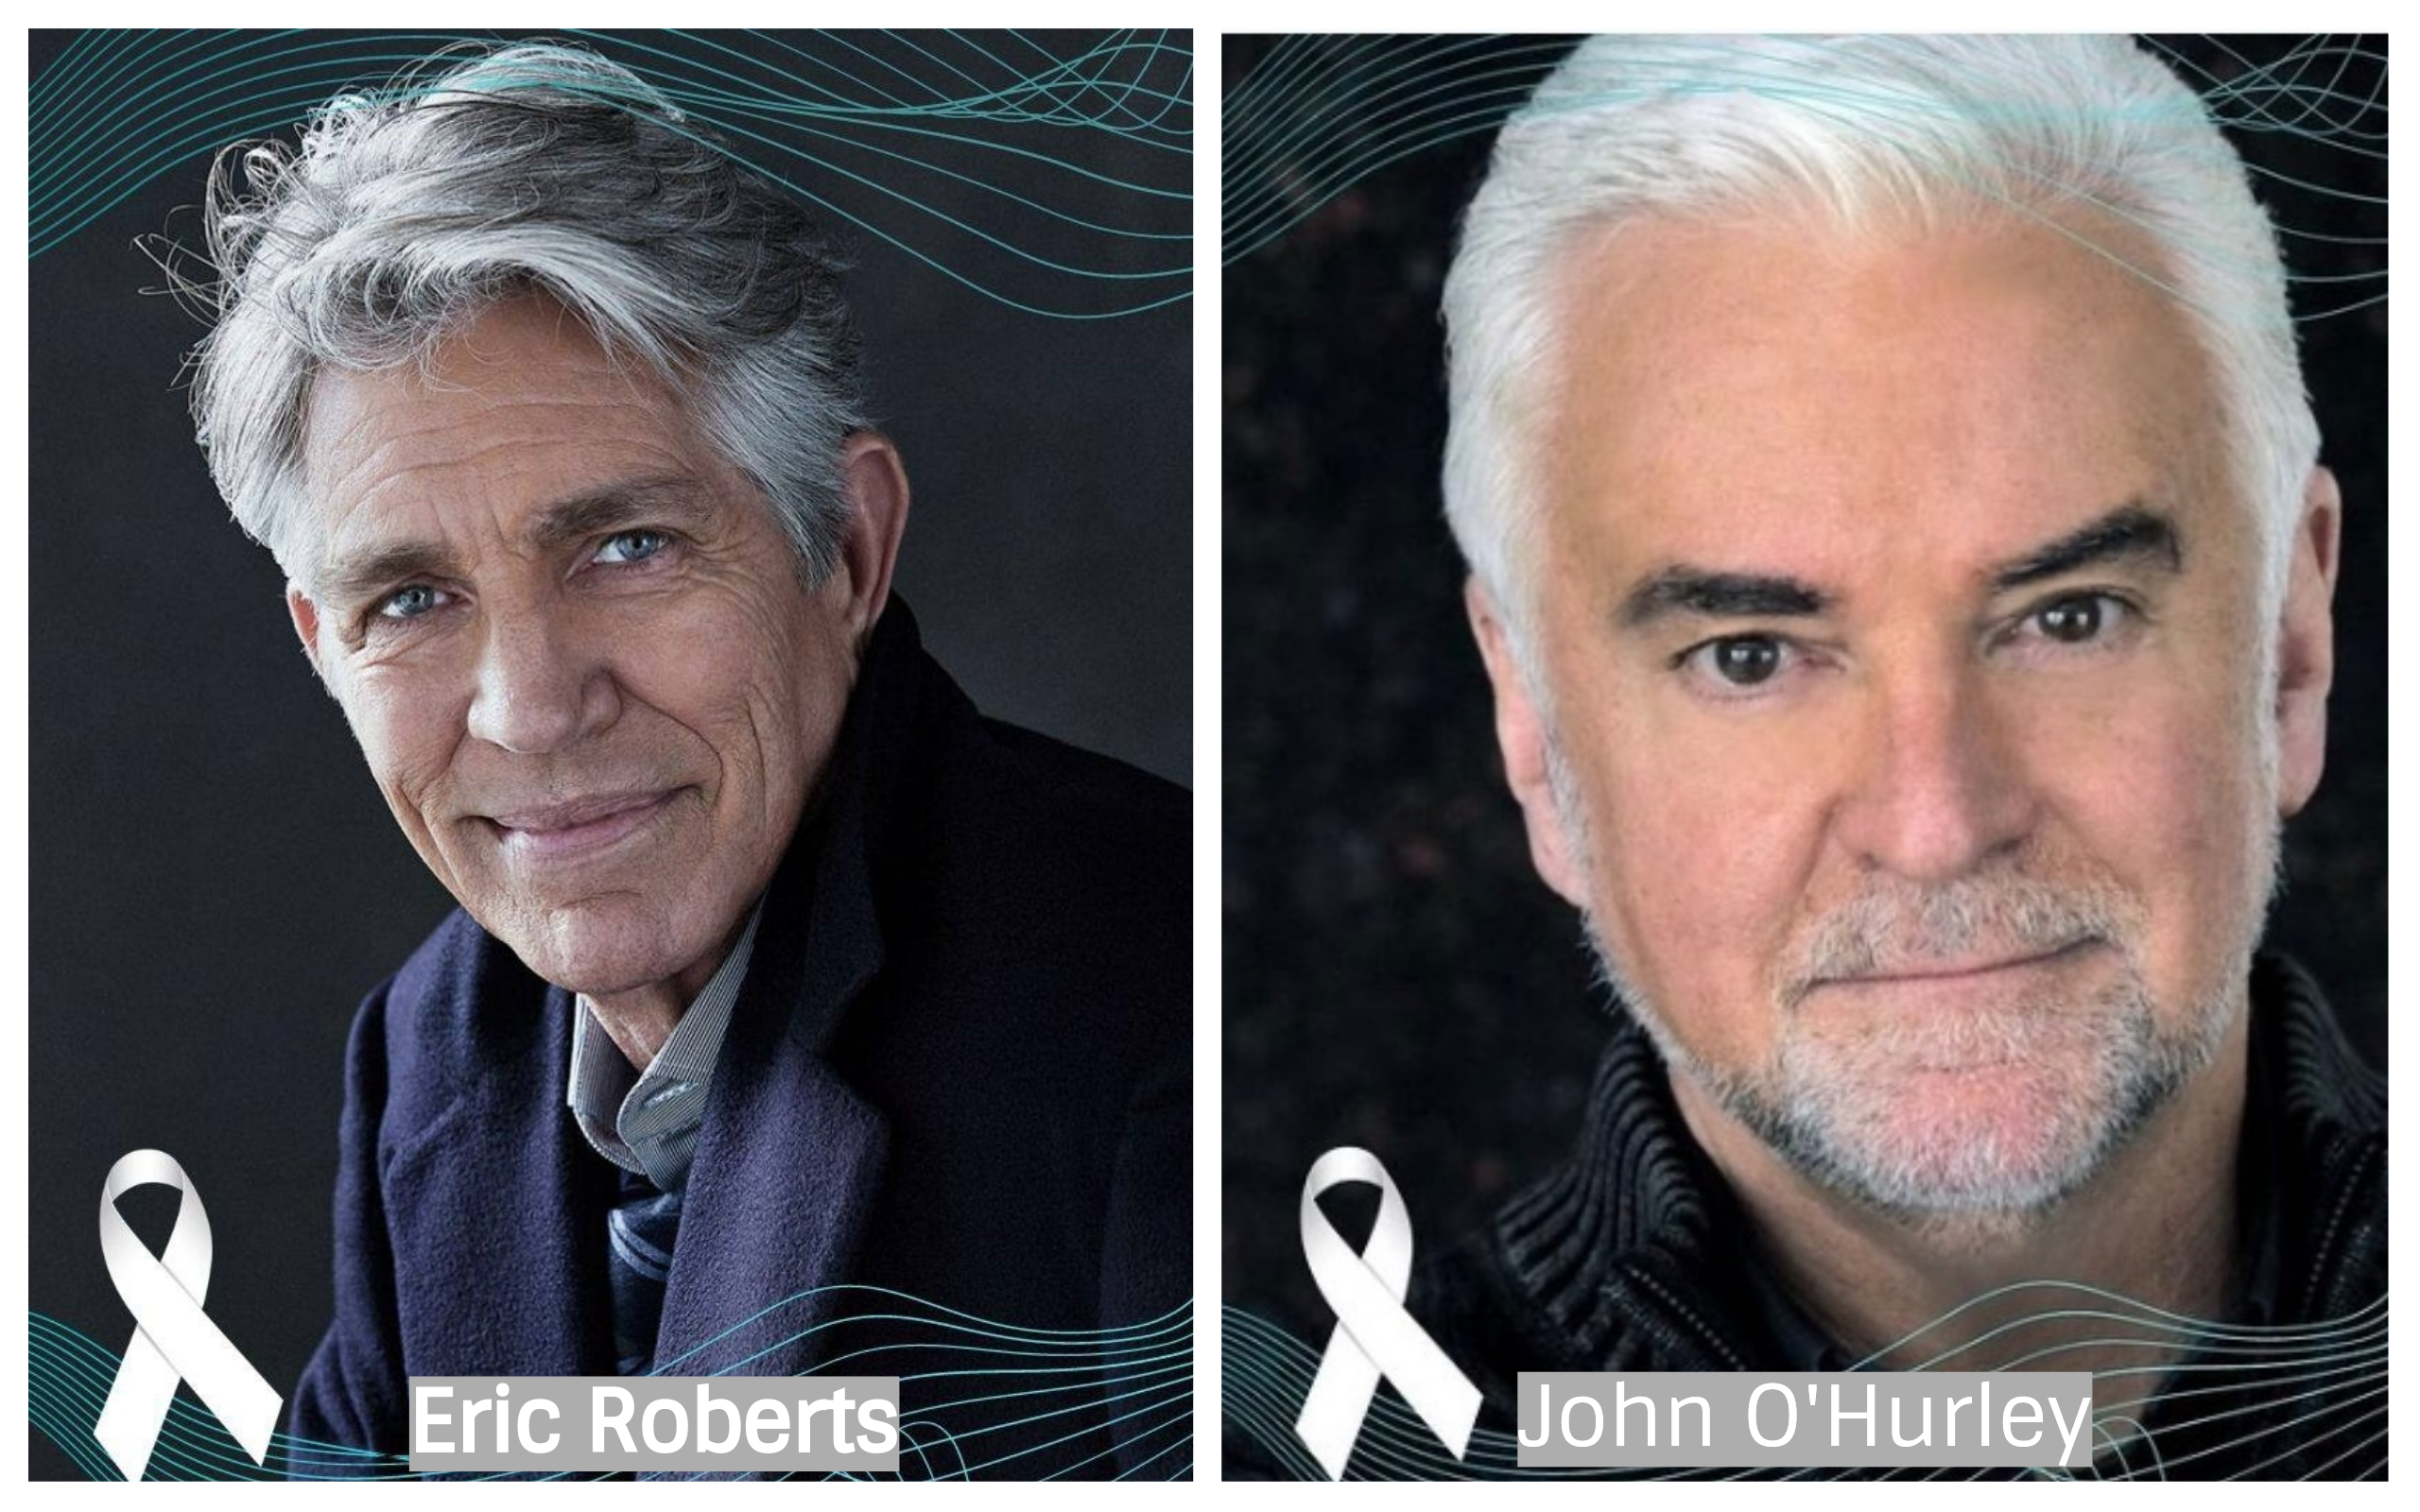 Hollywood Actors Eric Roberts and John O' Hurley Endorse the White Ribbon VA Campaign Against Domestic Violence